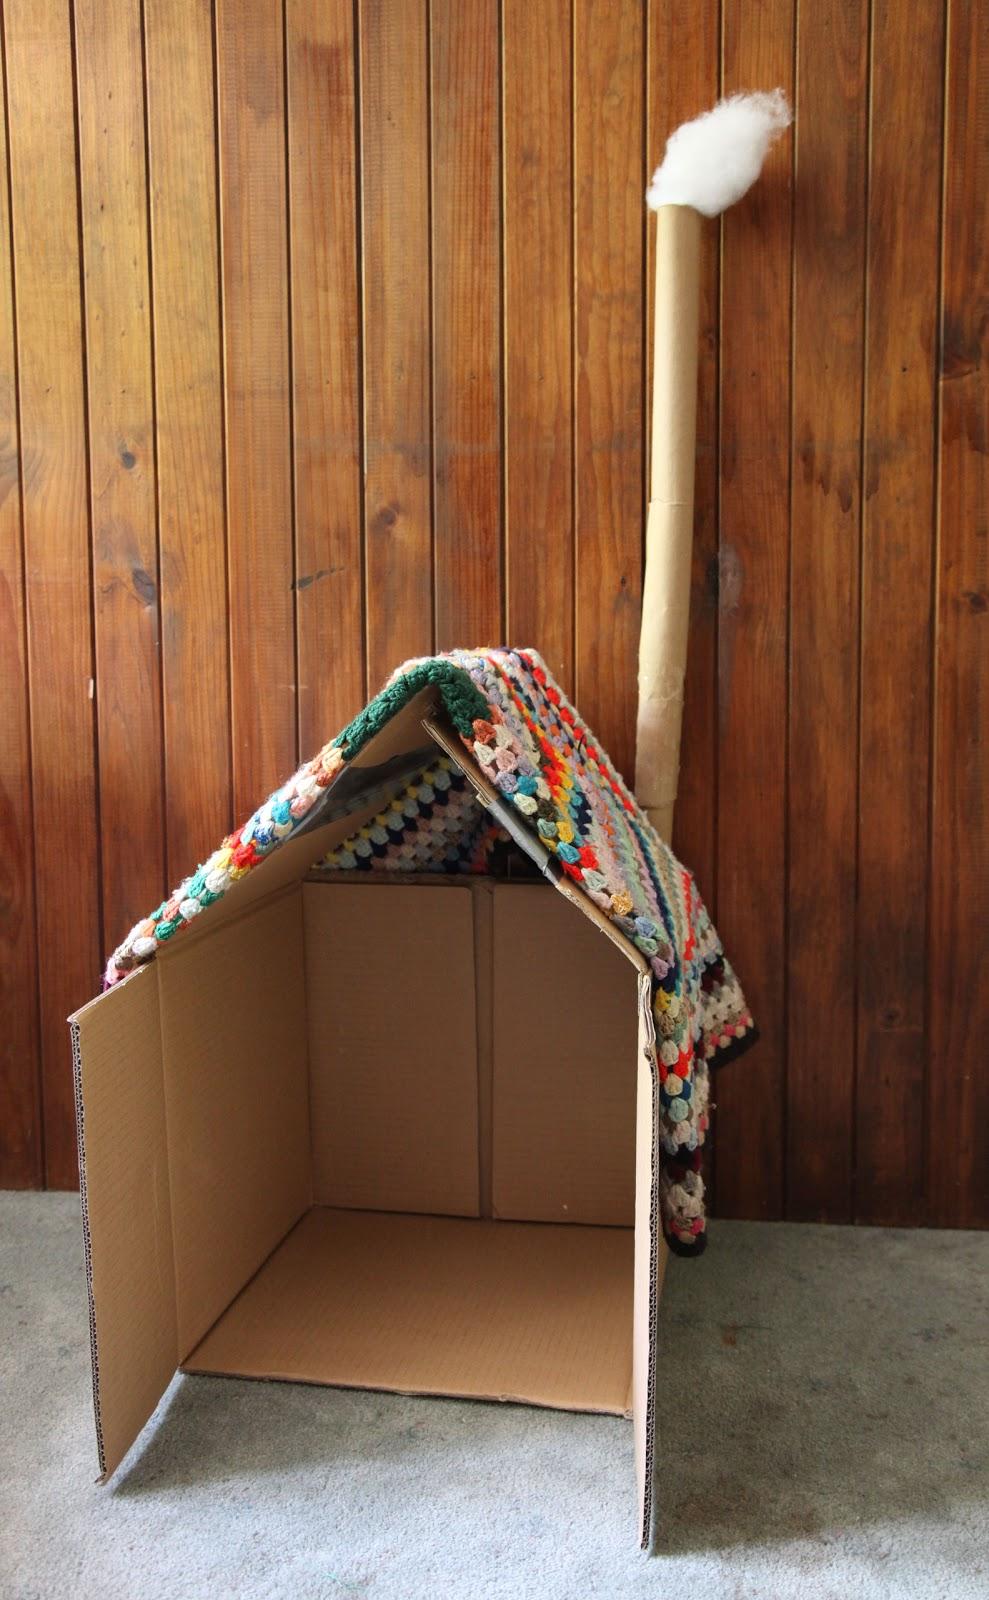 ruby hoppen casper 39 s cubby. Black Bedroom Furniture Sets. Home Design Ideas